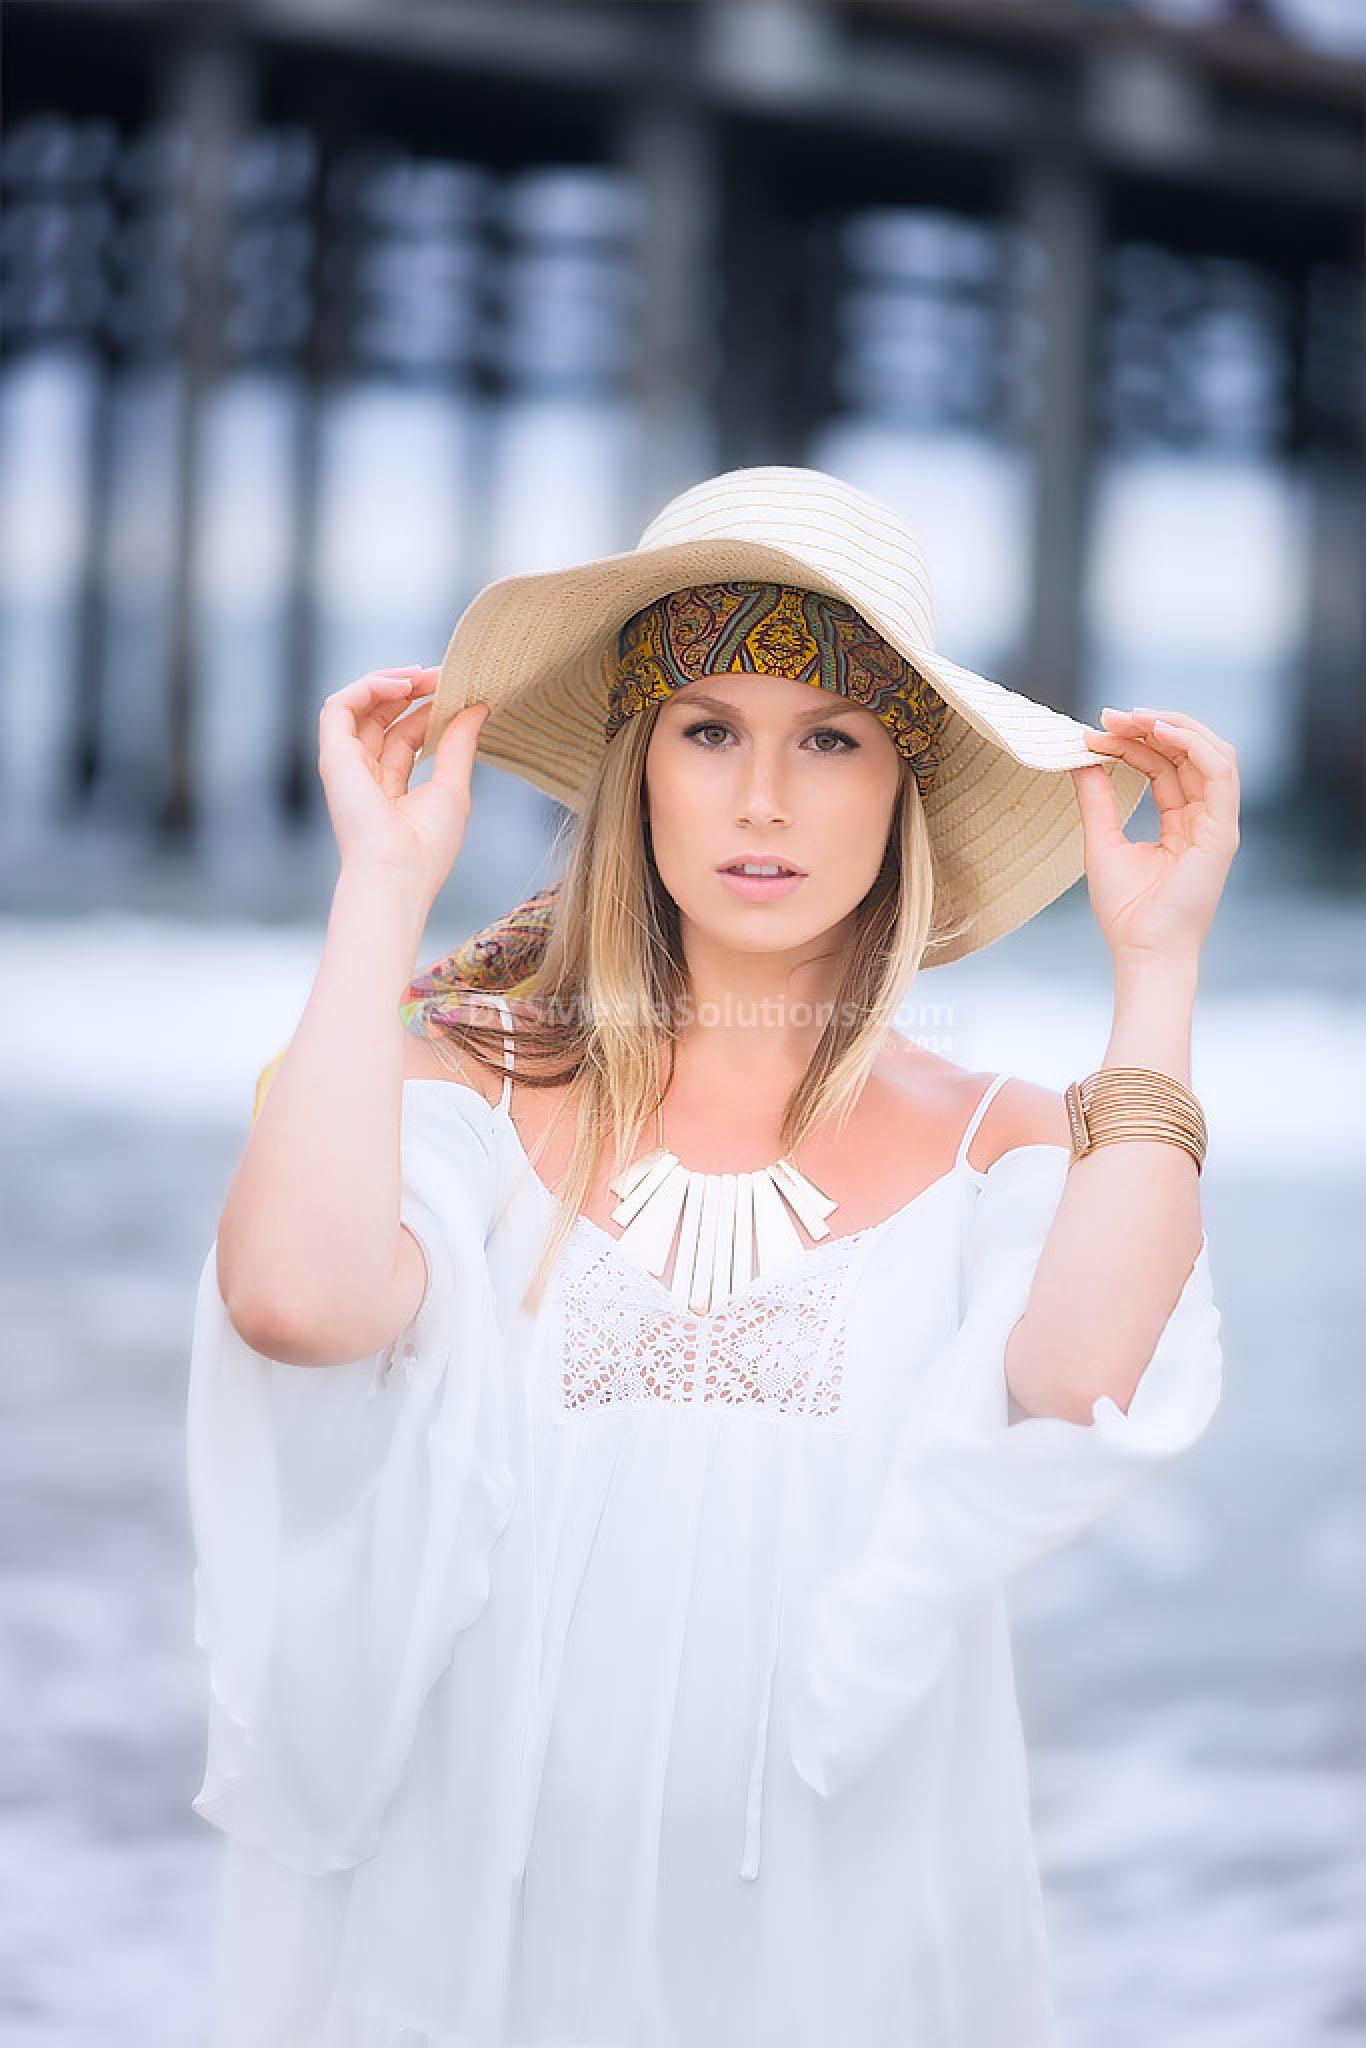 Photo in Portrait #model #female model #niki rae #beach #ocean #david k. smith #dks media solutions #santa monica pier #santa monica beach #santa monica #white sundress #sundress #head scarf #hat #straw hat #white straw hat #white hat